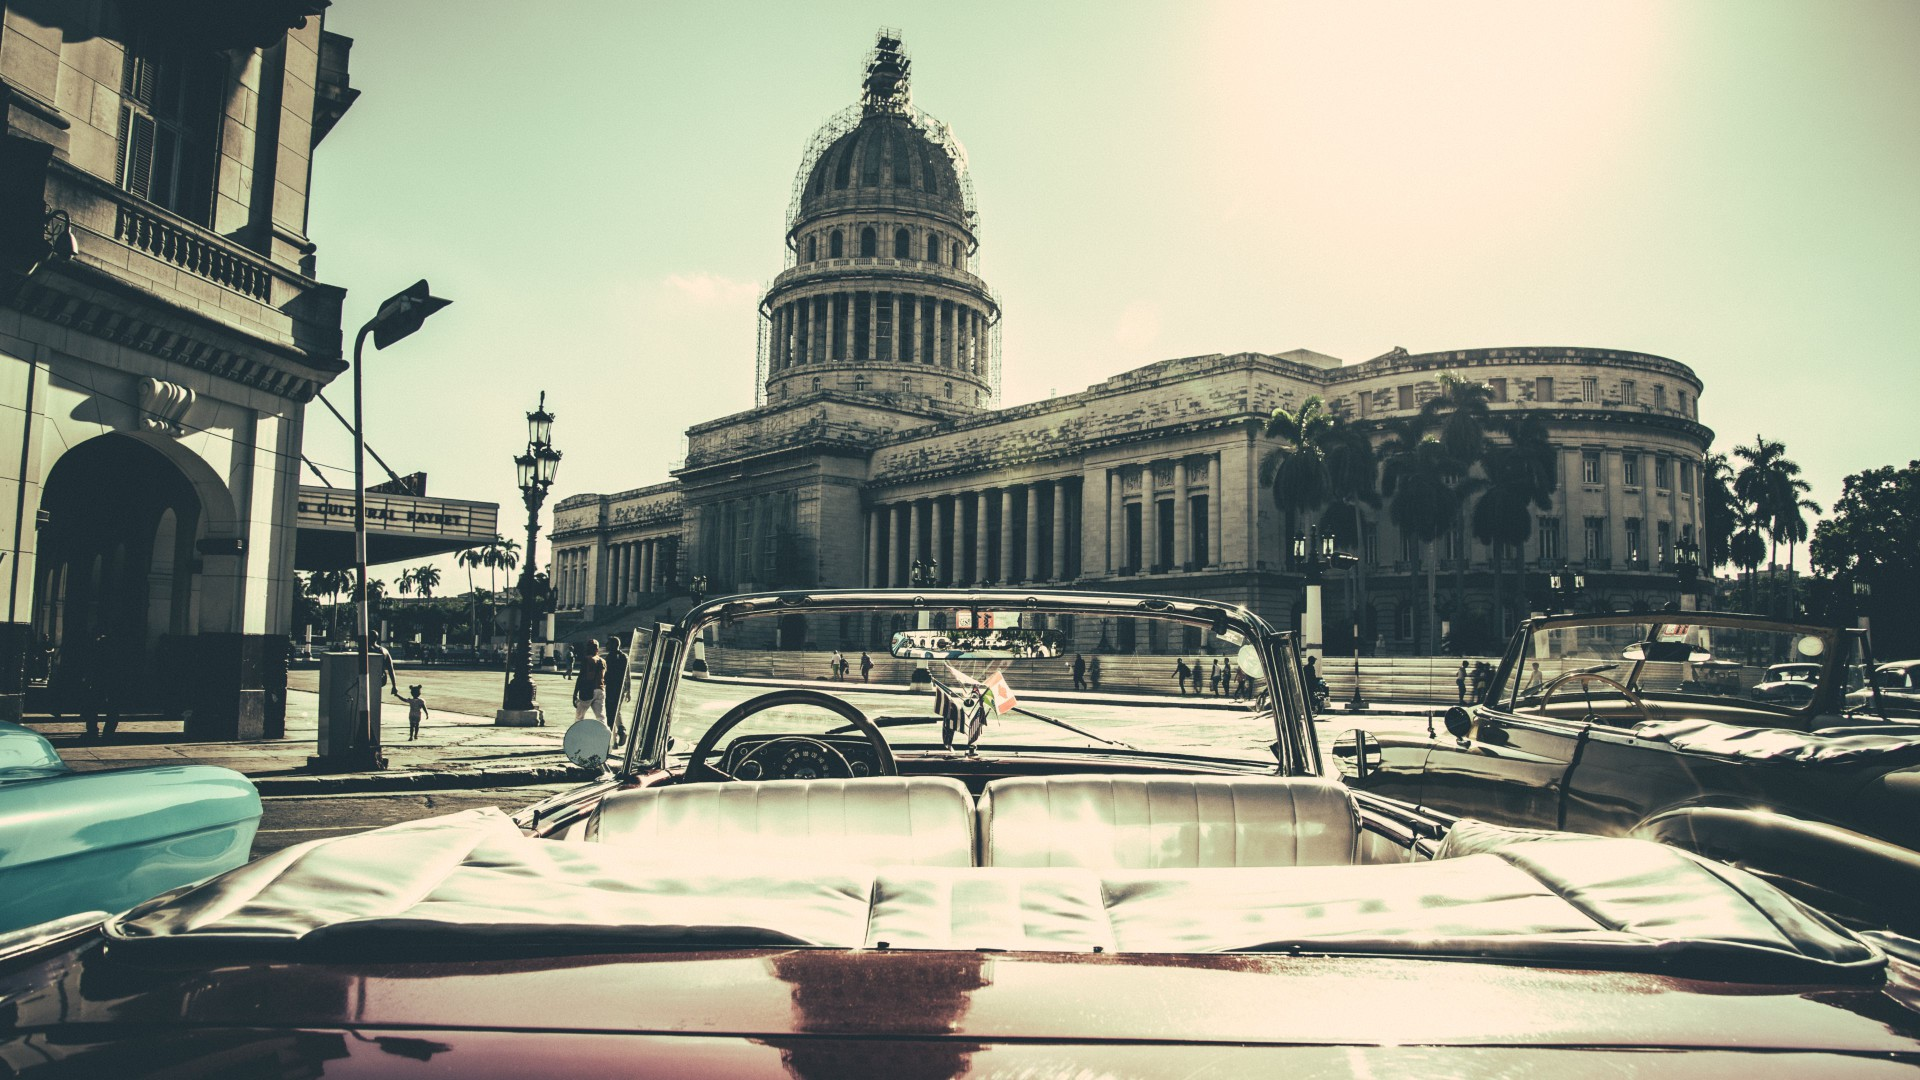 Wallpaper Havana City Buildings Car Cuba Desktop 1920x1080